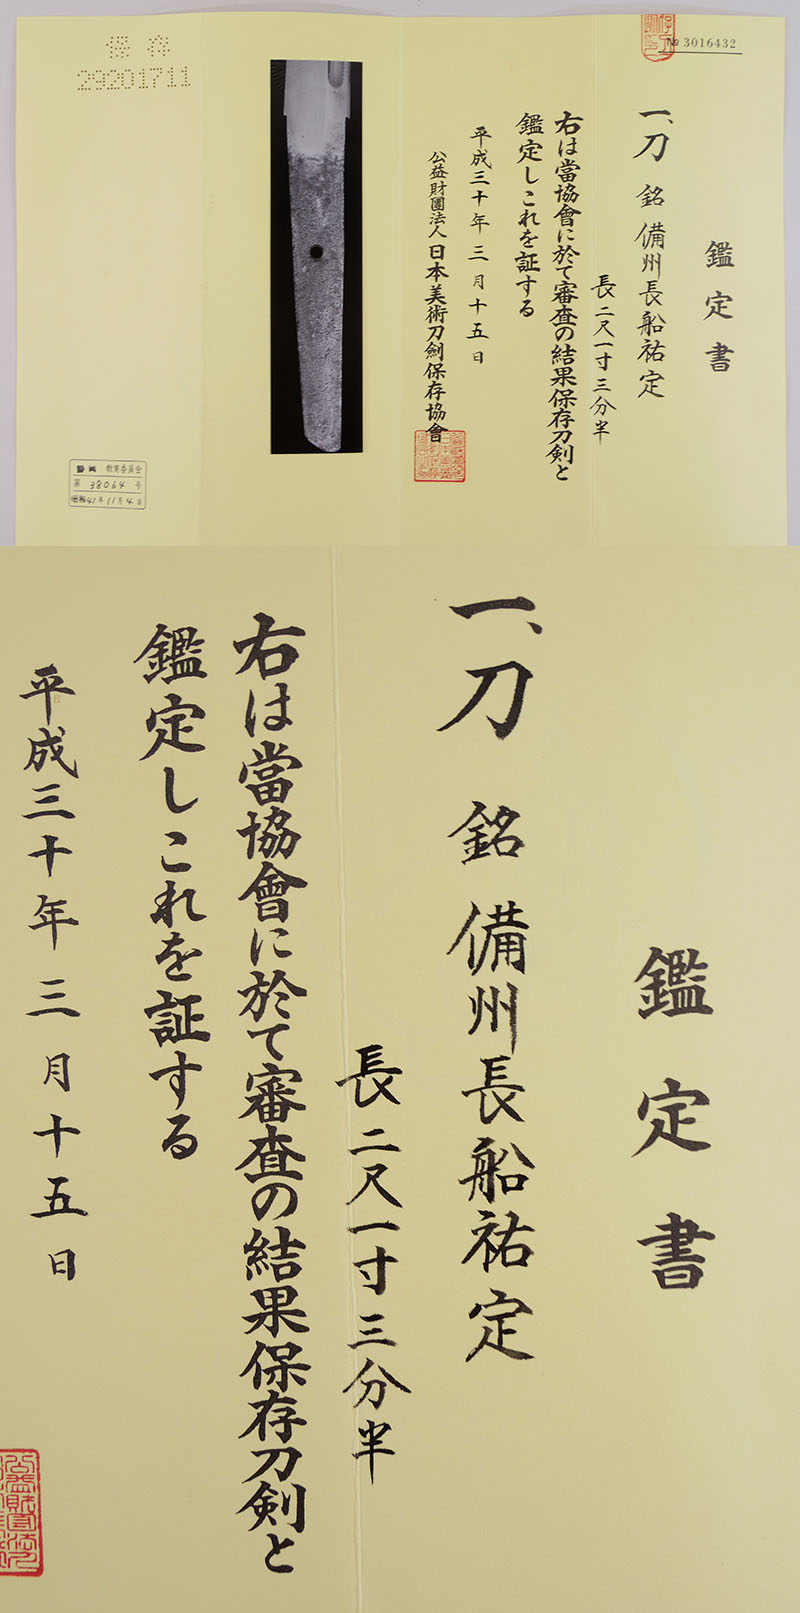 刀 備州長船祐定 Picture of Certificate